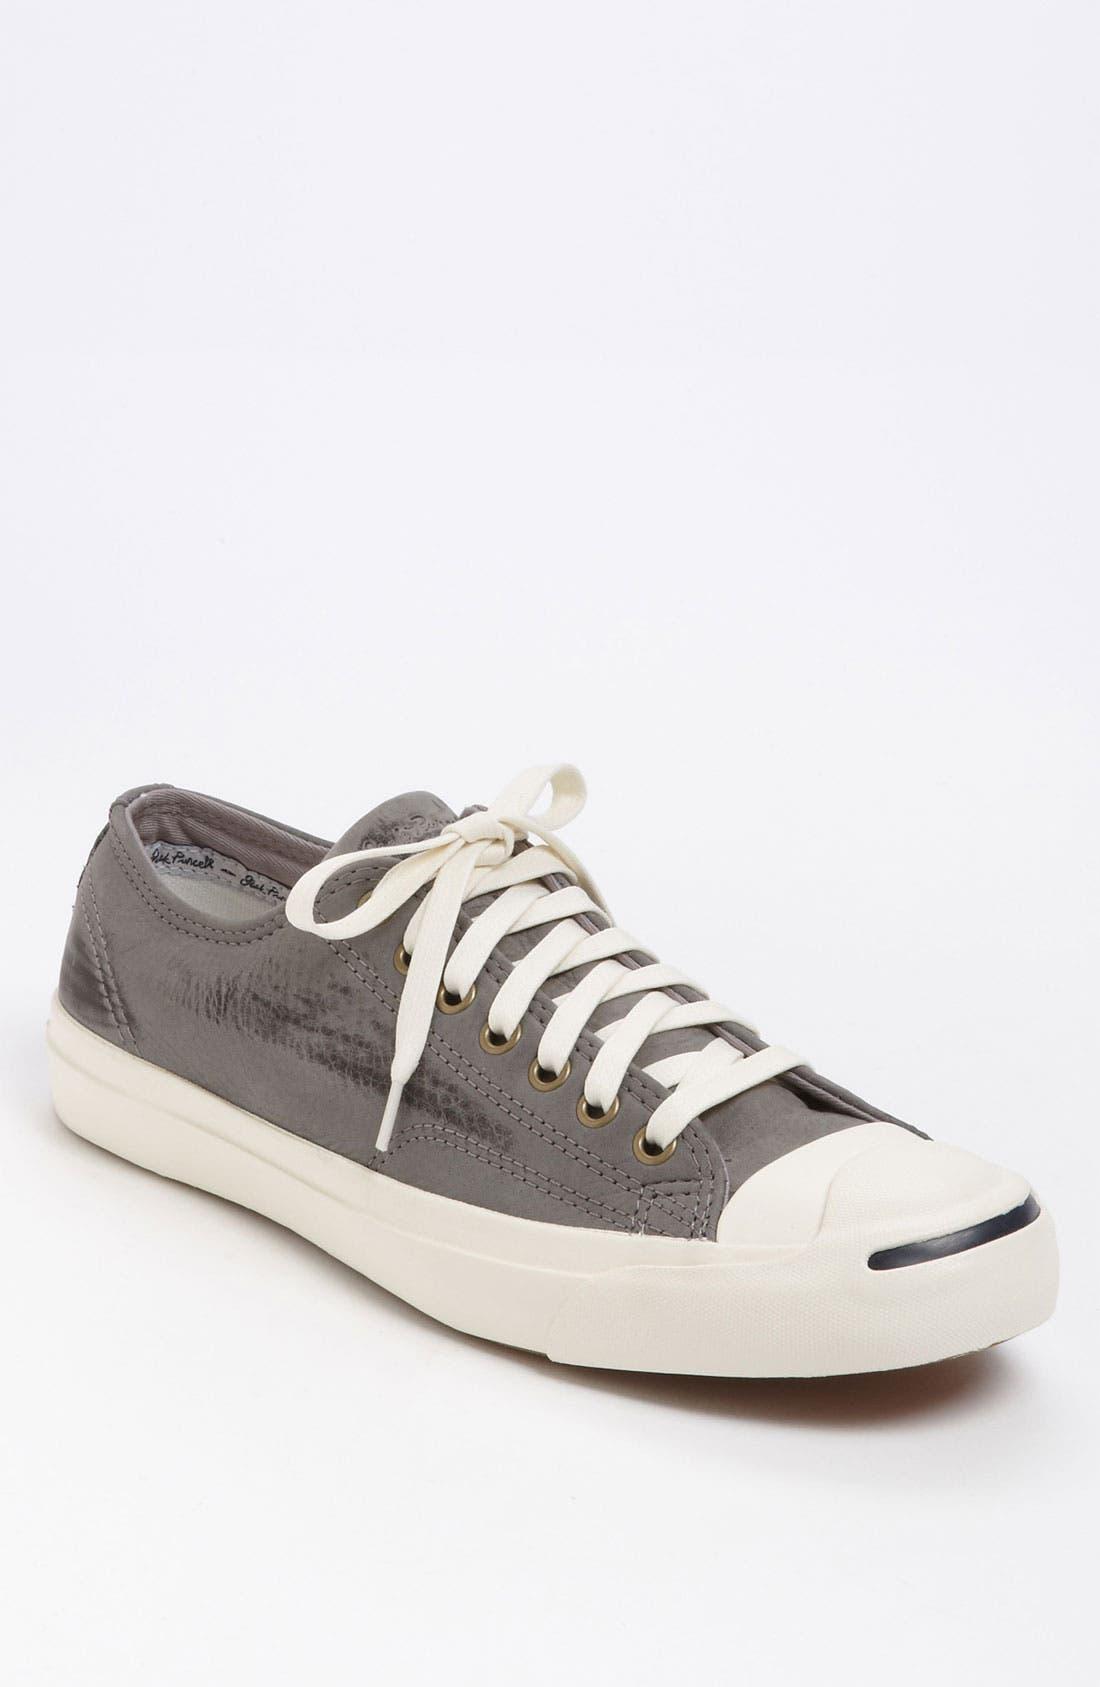 Alternate Image 1 Selected - Converse 'Jack Purcell LTT' Leather Sneaker (Men)